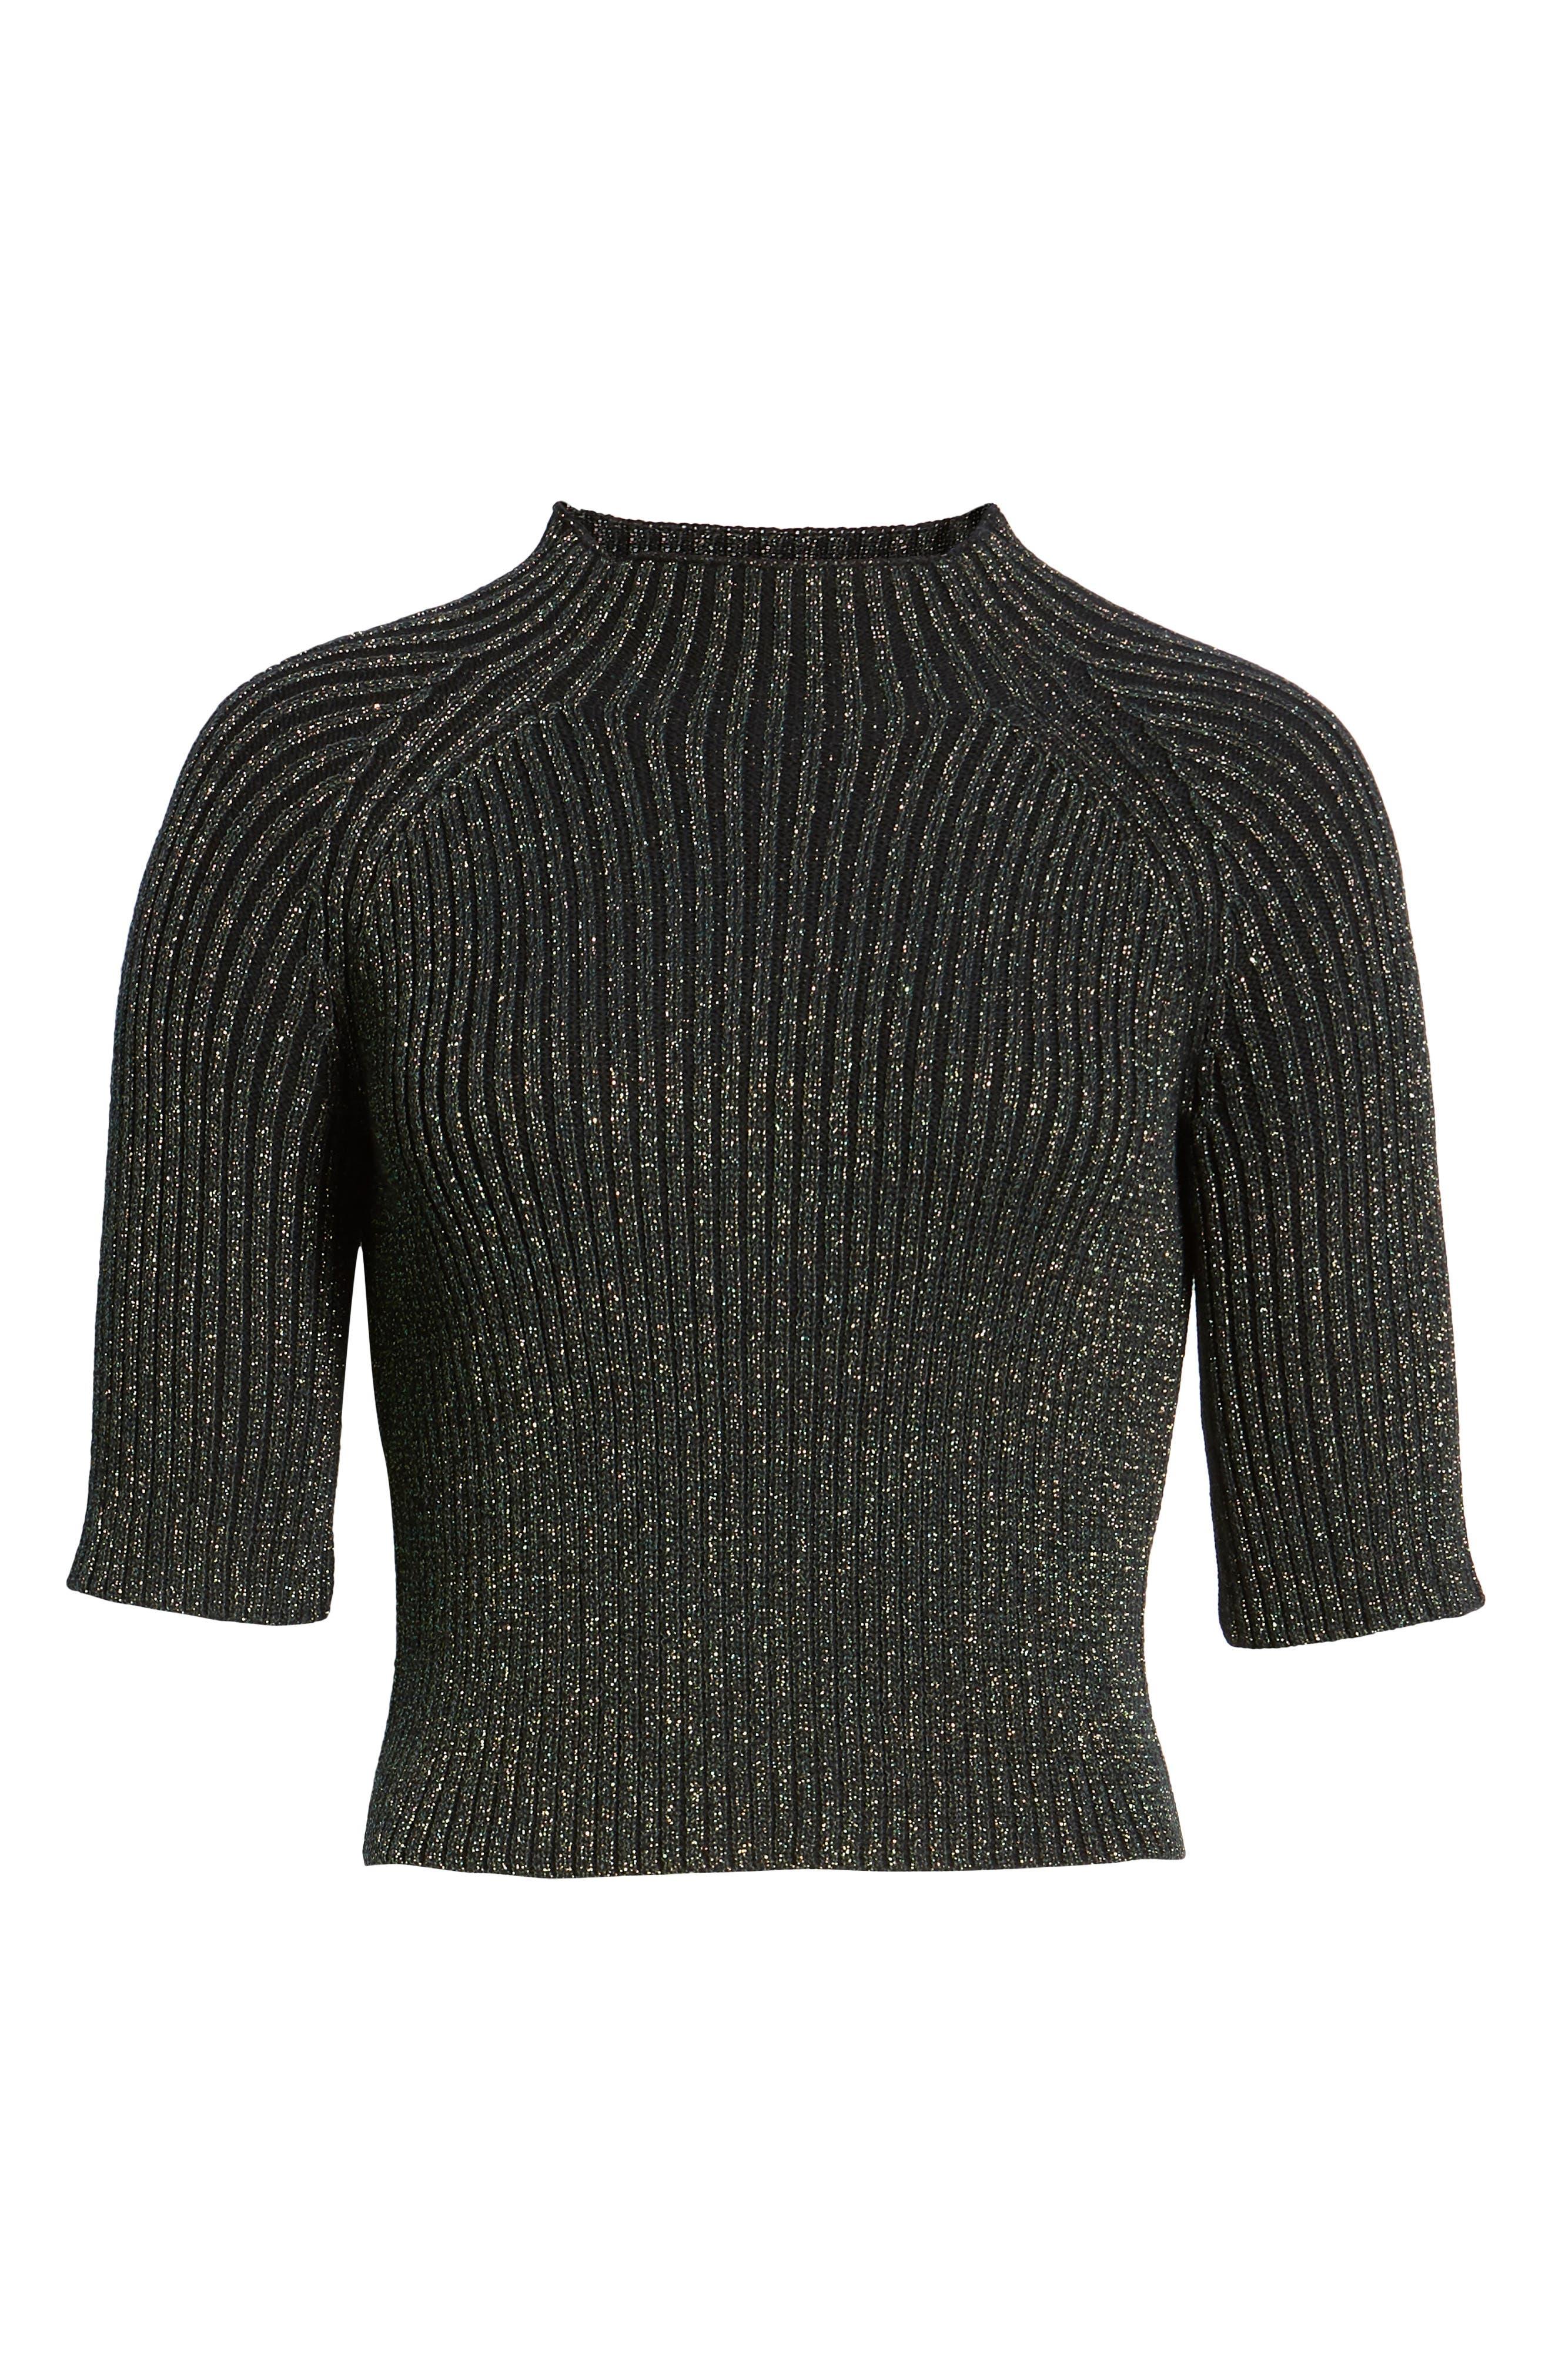 Sparkle Crop Sweater,                             Alternate thumbnail 6, color,                             GREEN BOTANICAL METALLIC